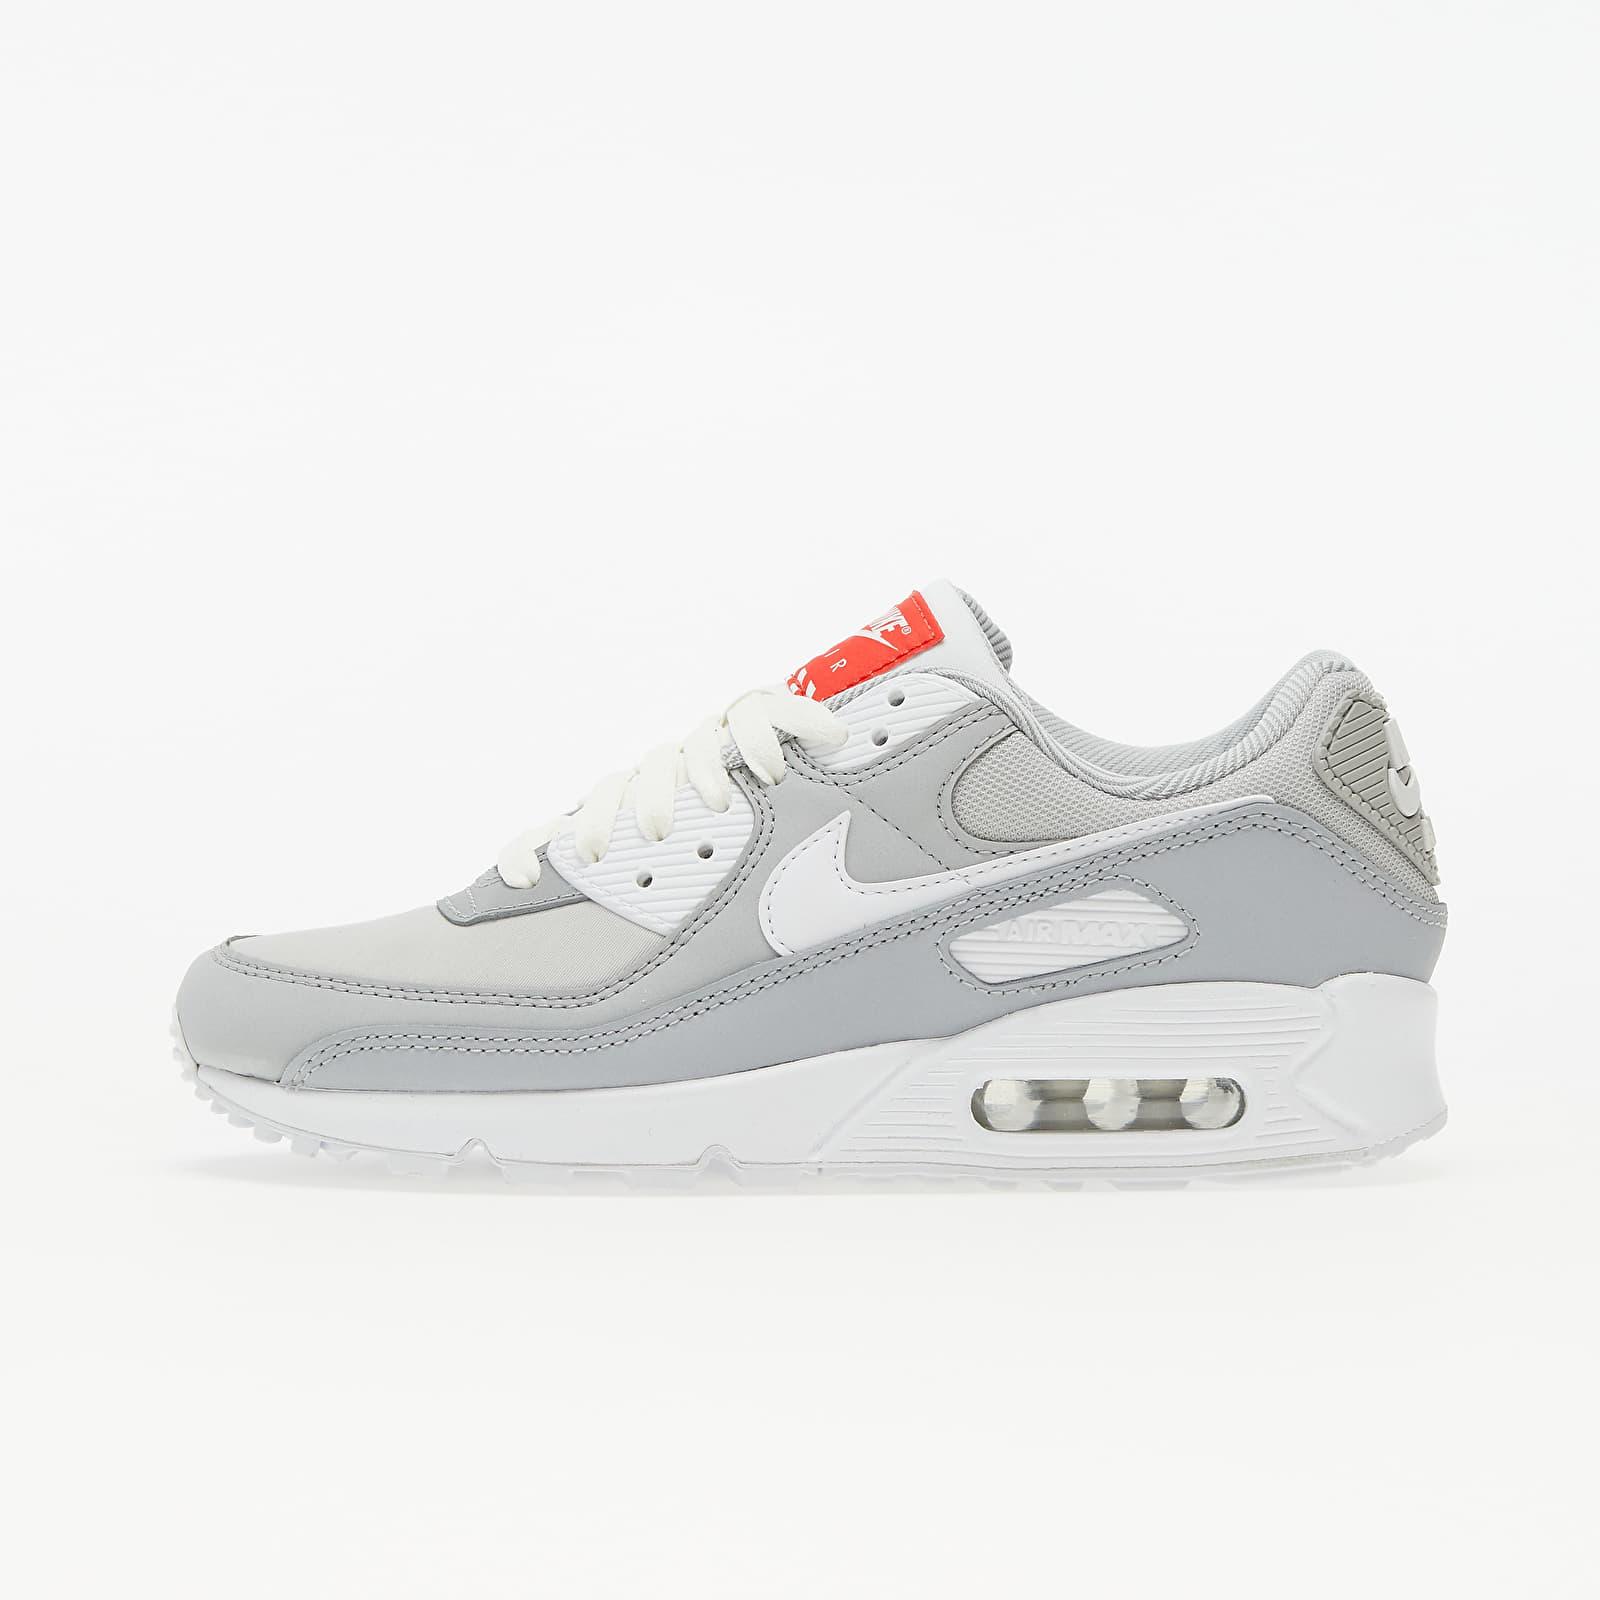 Nike W Air Max 90 Lt Smoke Grey/ White-Summit White EUR 38